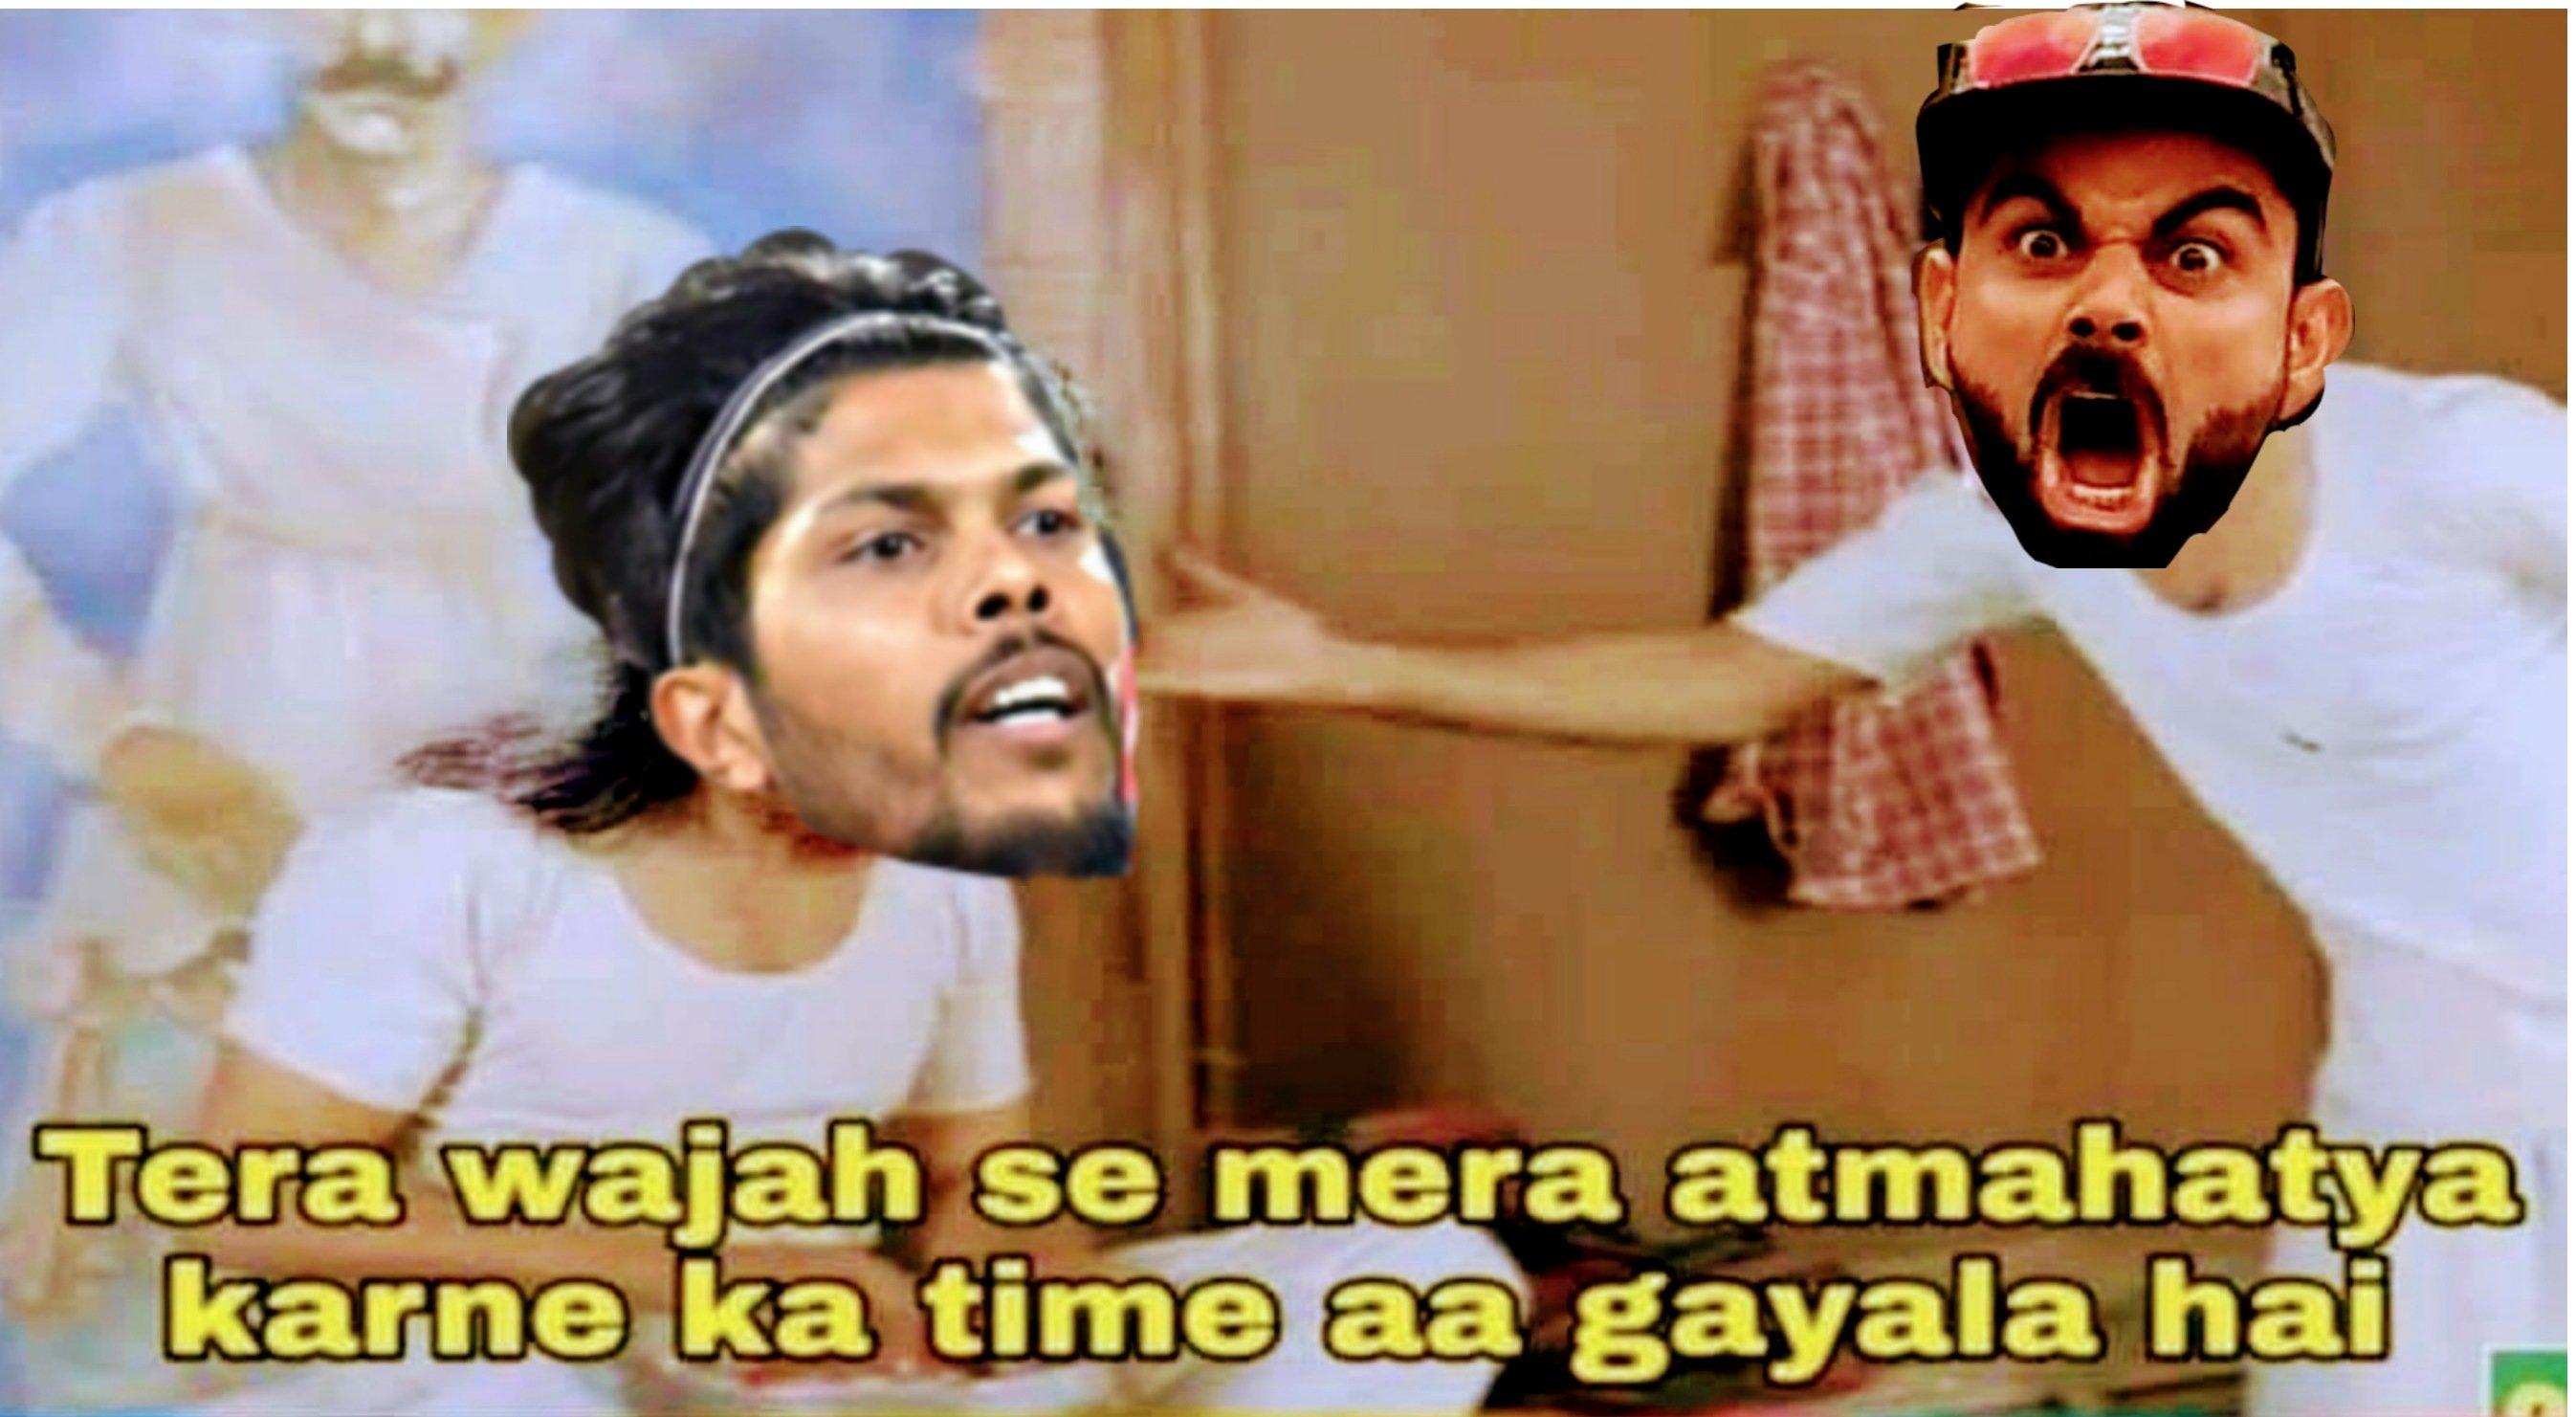 Umesh yadav and Virat kholi memes